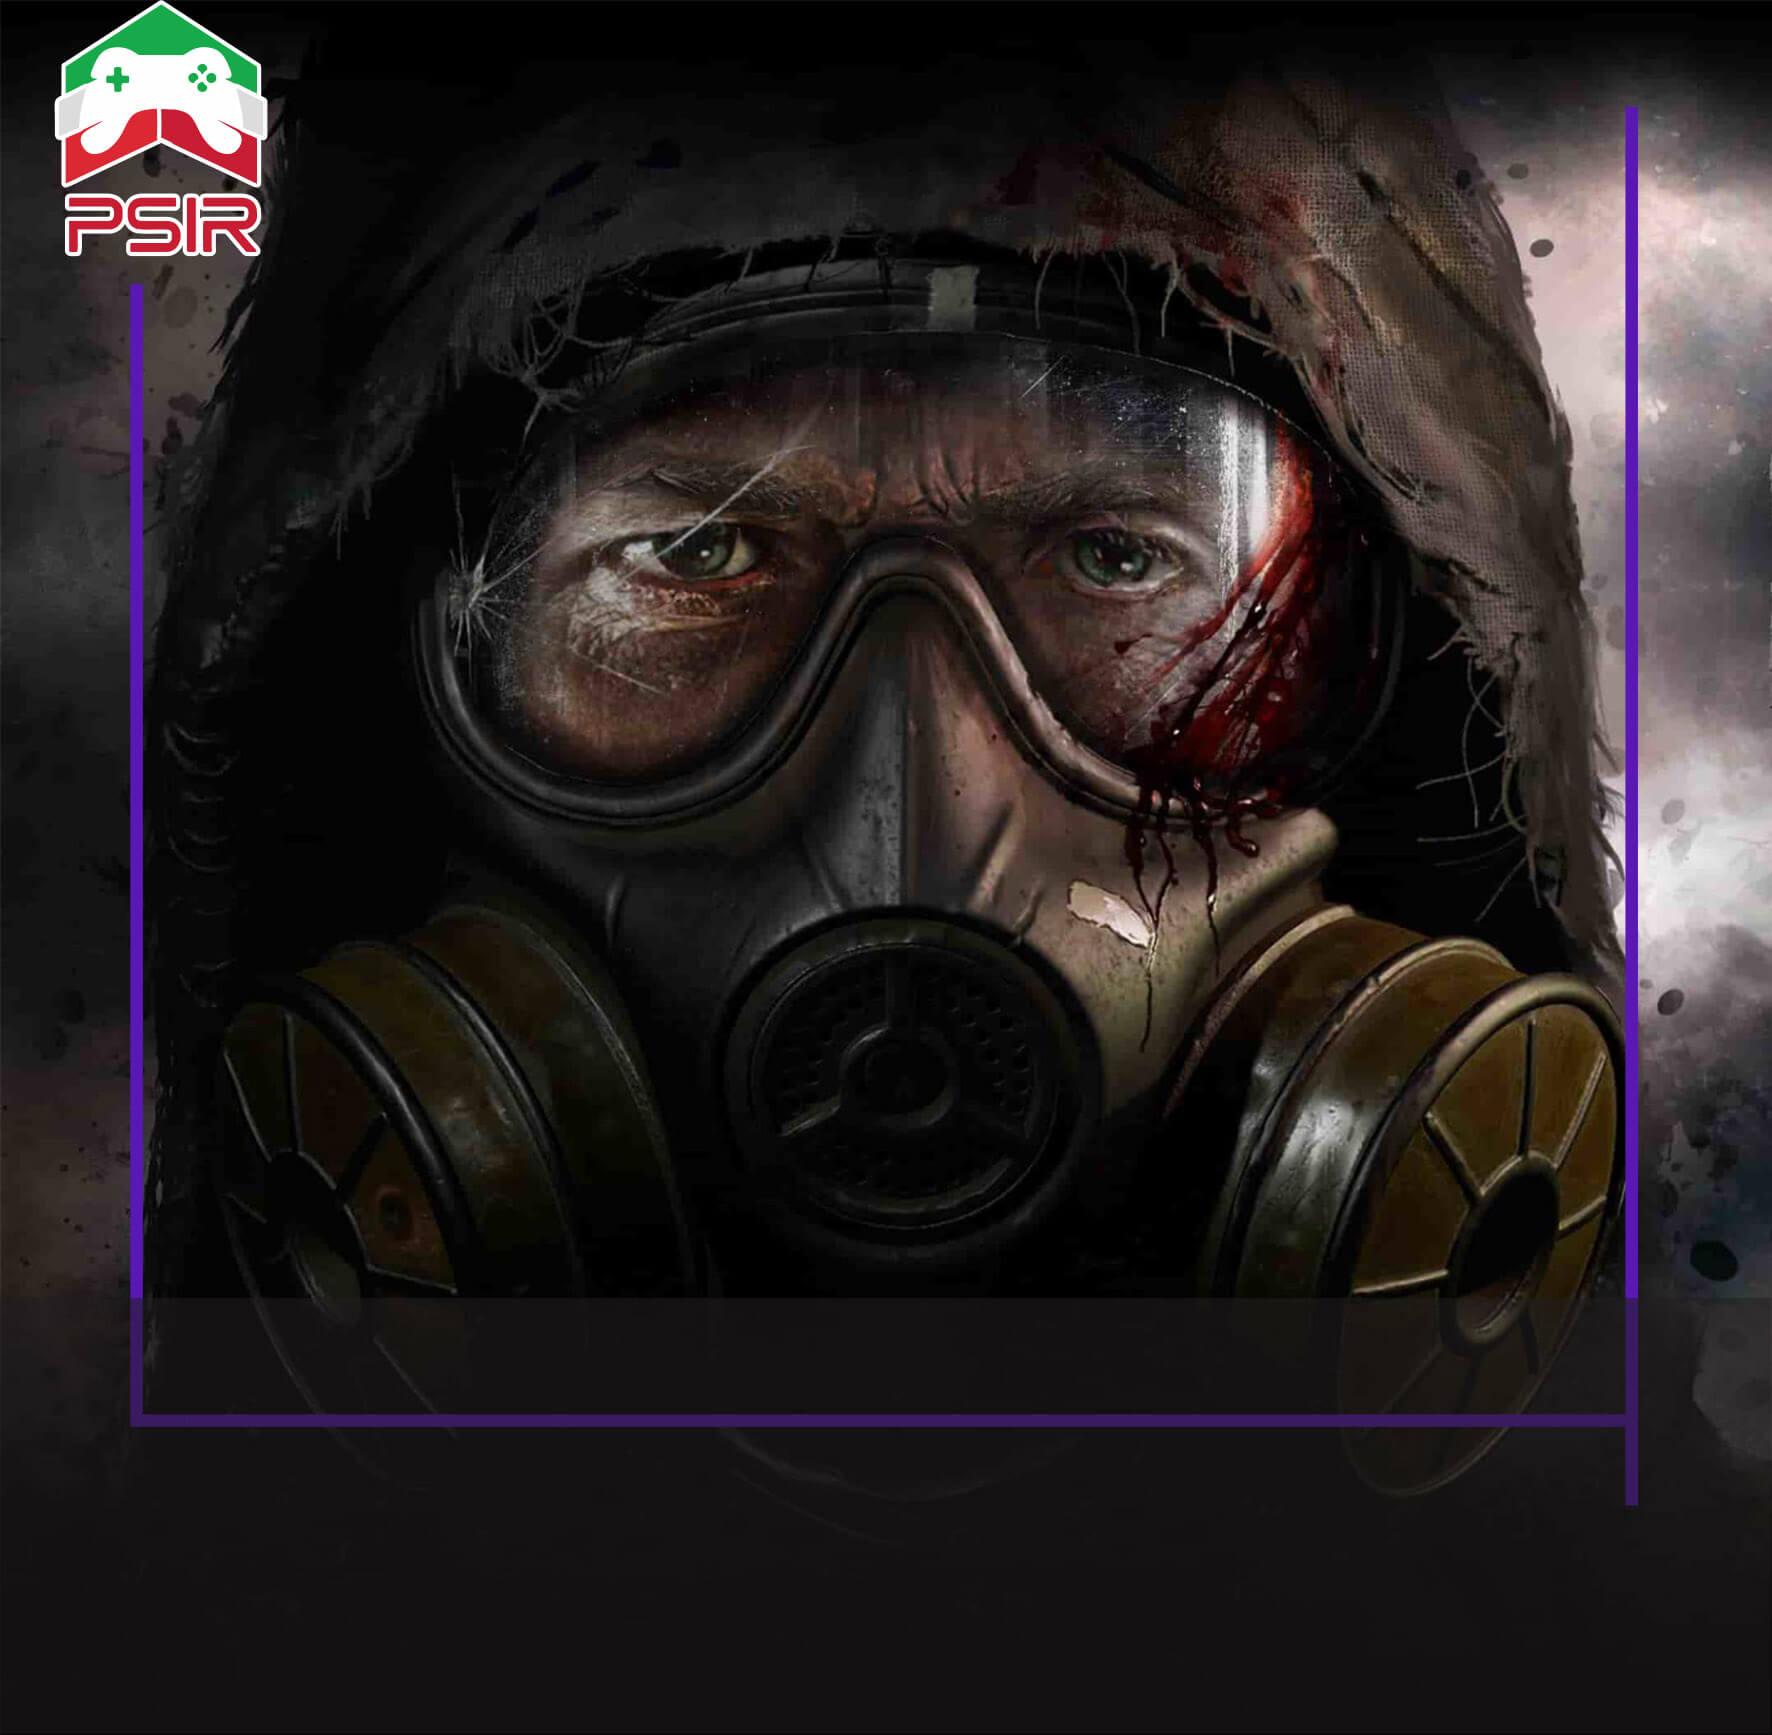 تصویر شاخص بازی stalker 2